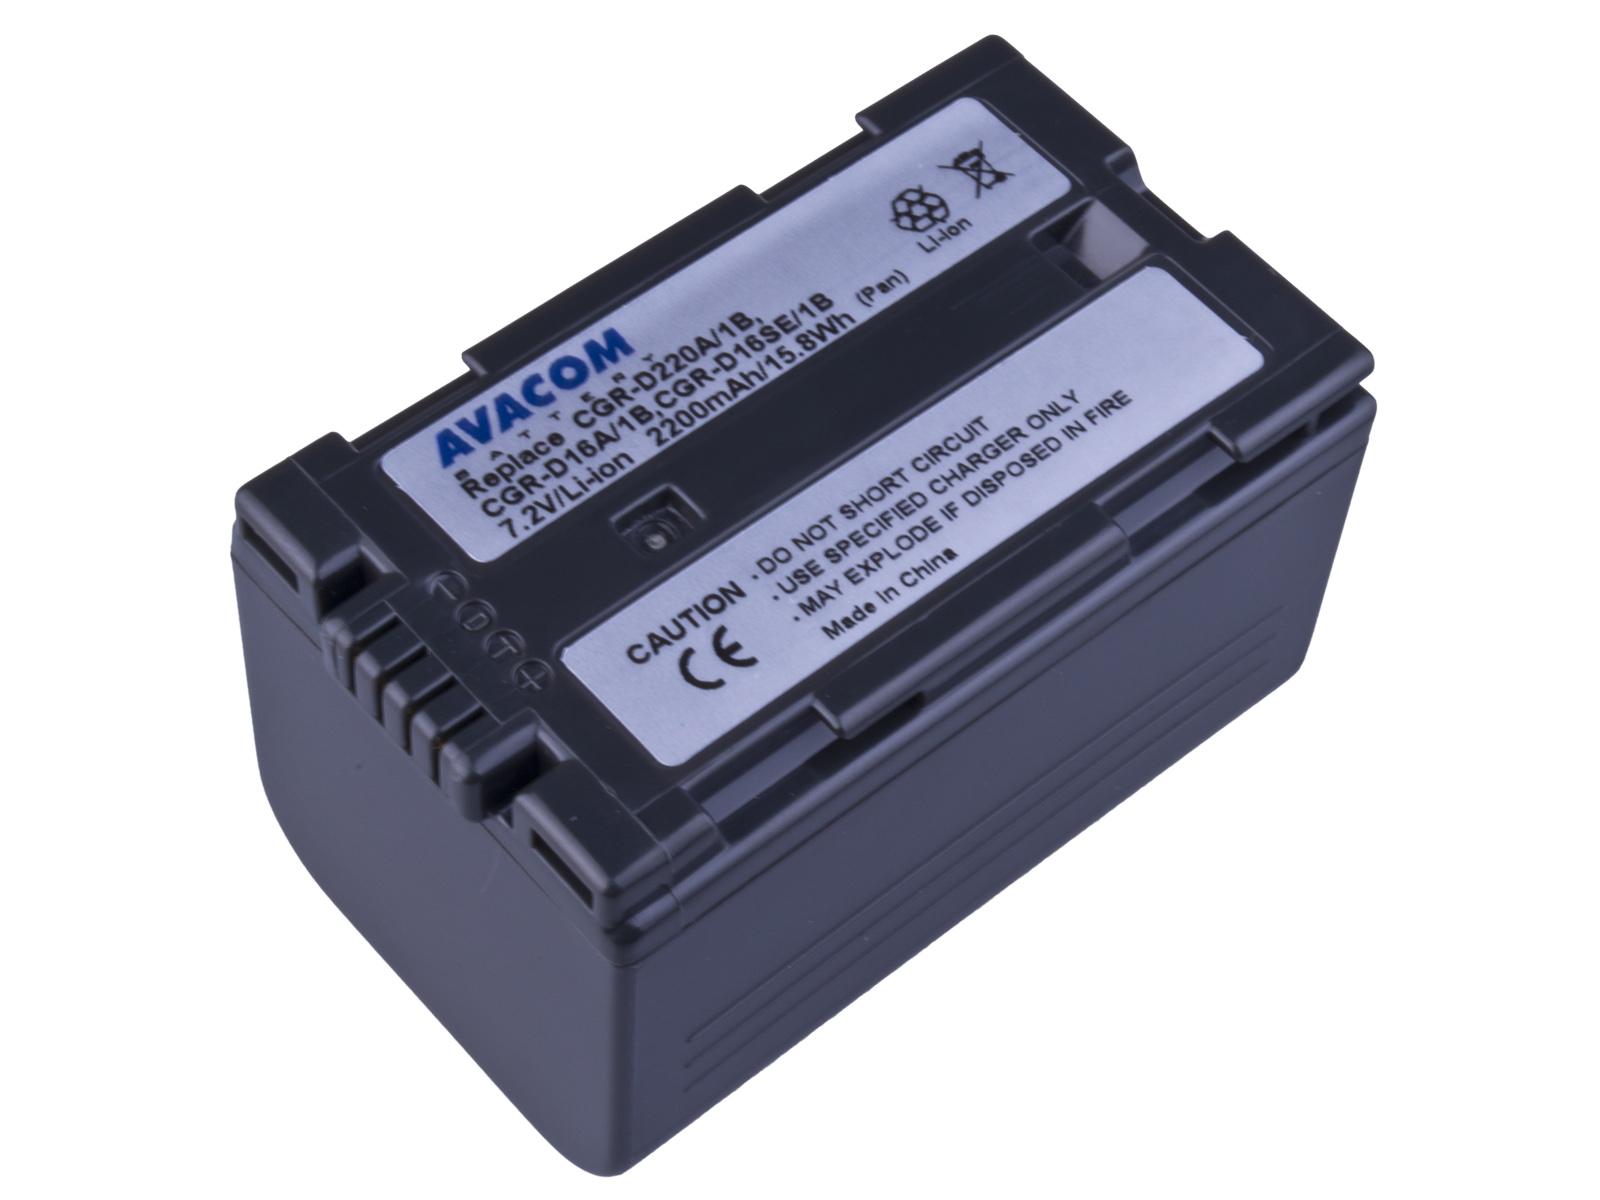 Baterie AVACOM Panasonic CGR-D220  Li-ion 7.2V 220